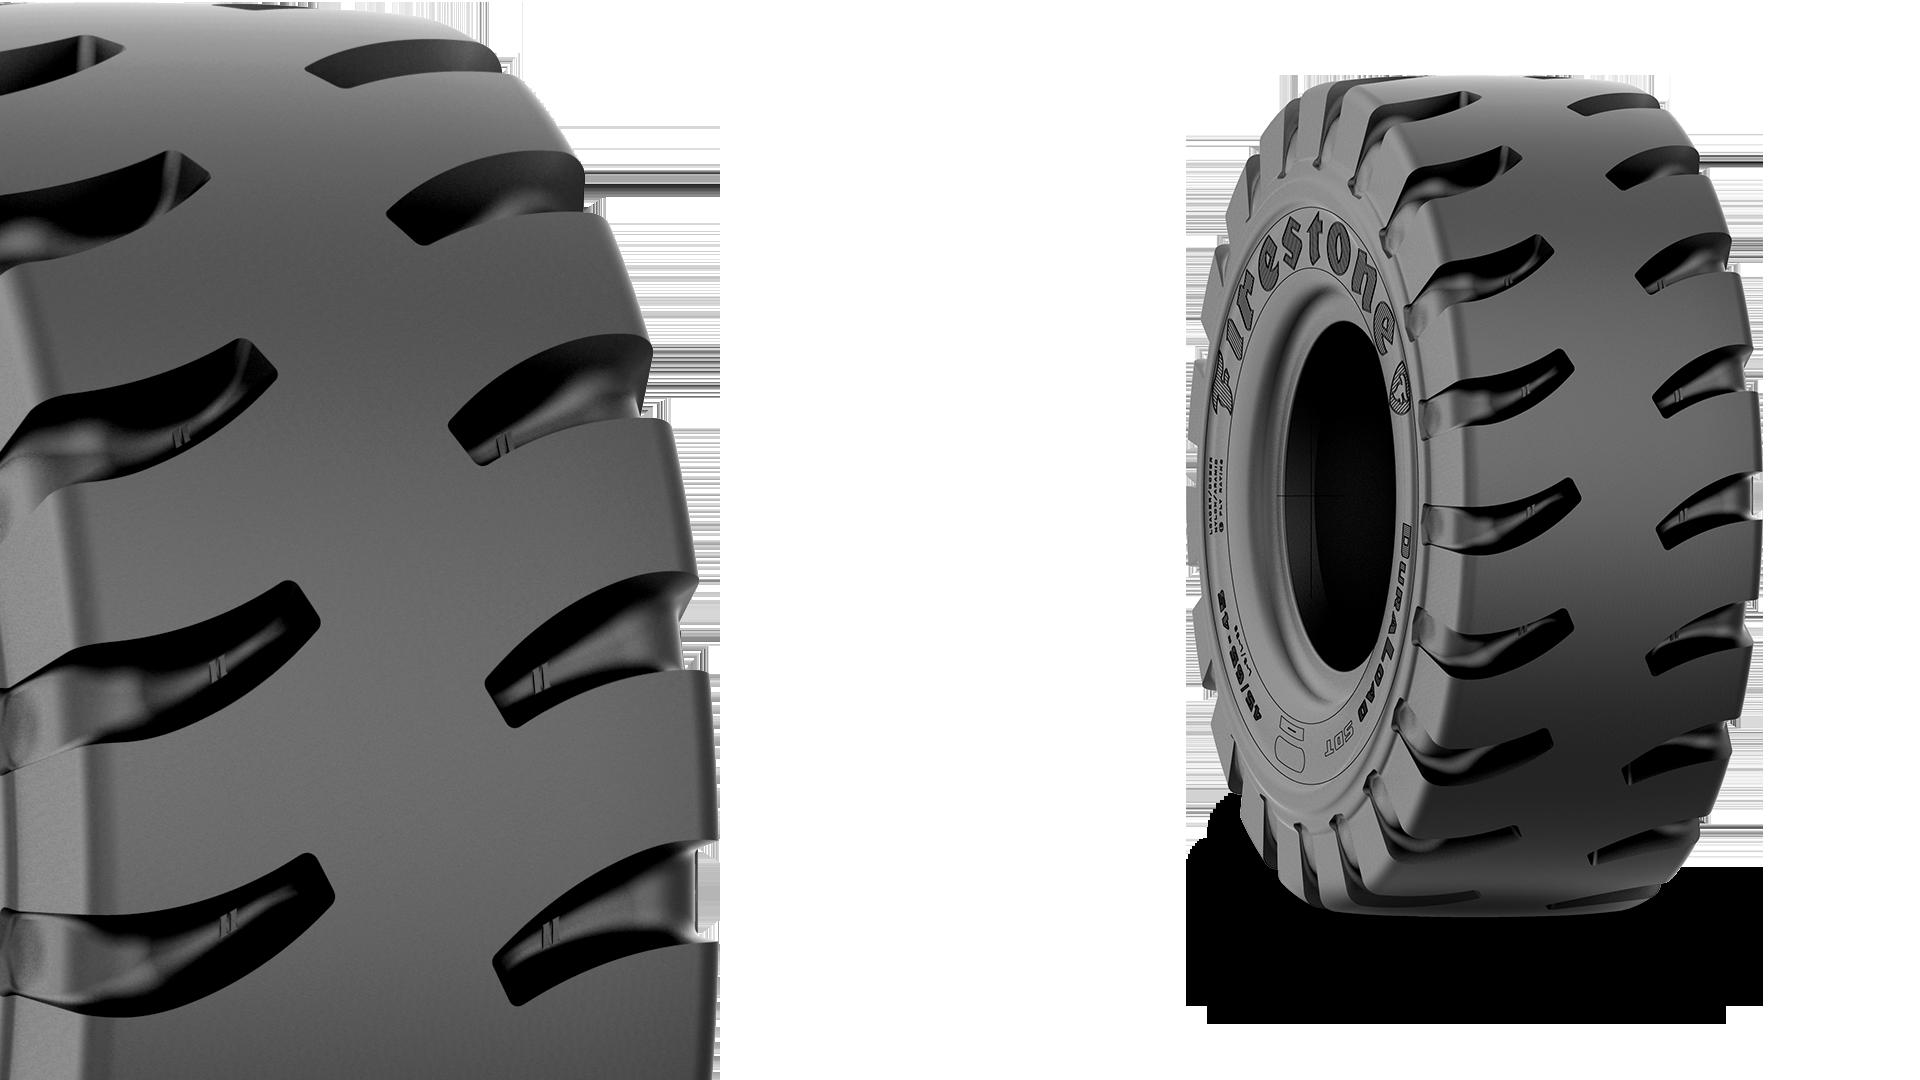 Duraload deep tread tire firestone commercial - Tire tread wallpaper ...